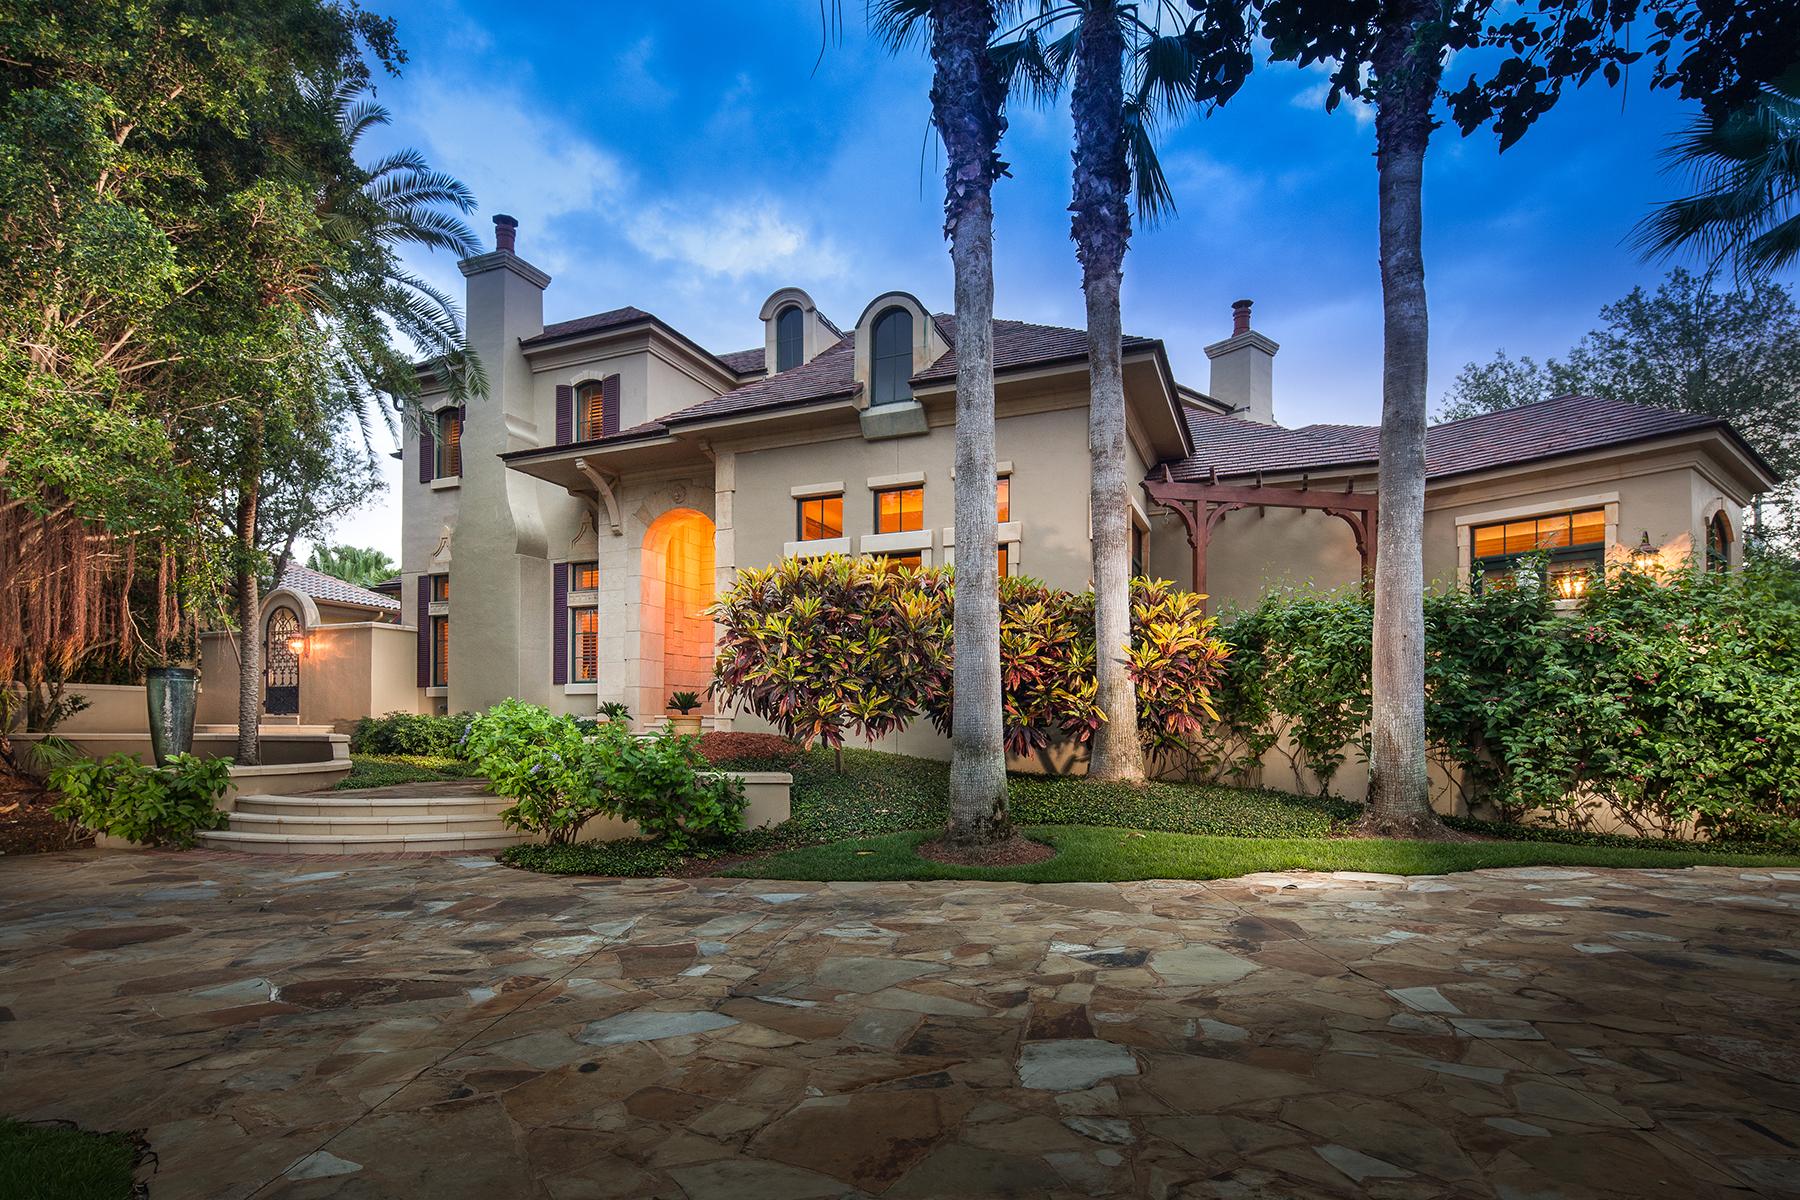 Villa per Vendita alle ore 3200 Gordon Dr , Naples, FL 34102 3200 Gordon Dr Naples, Florida, 34102 Stati Uniti